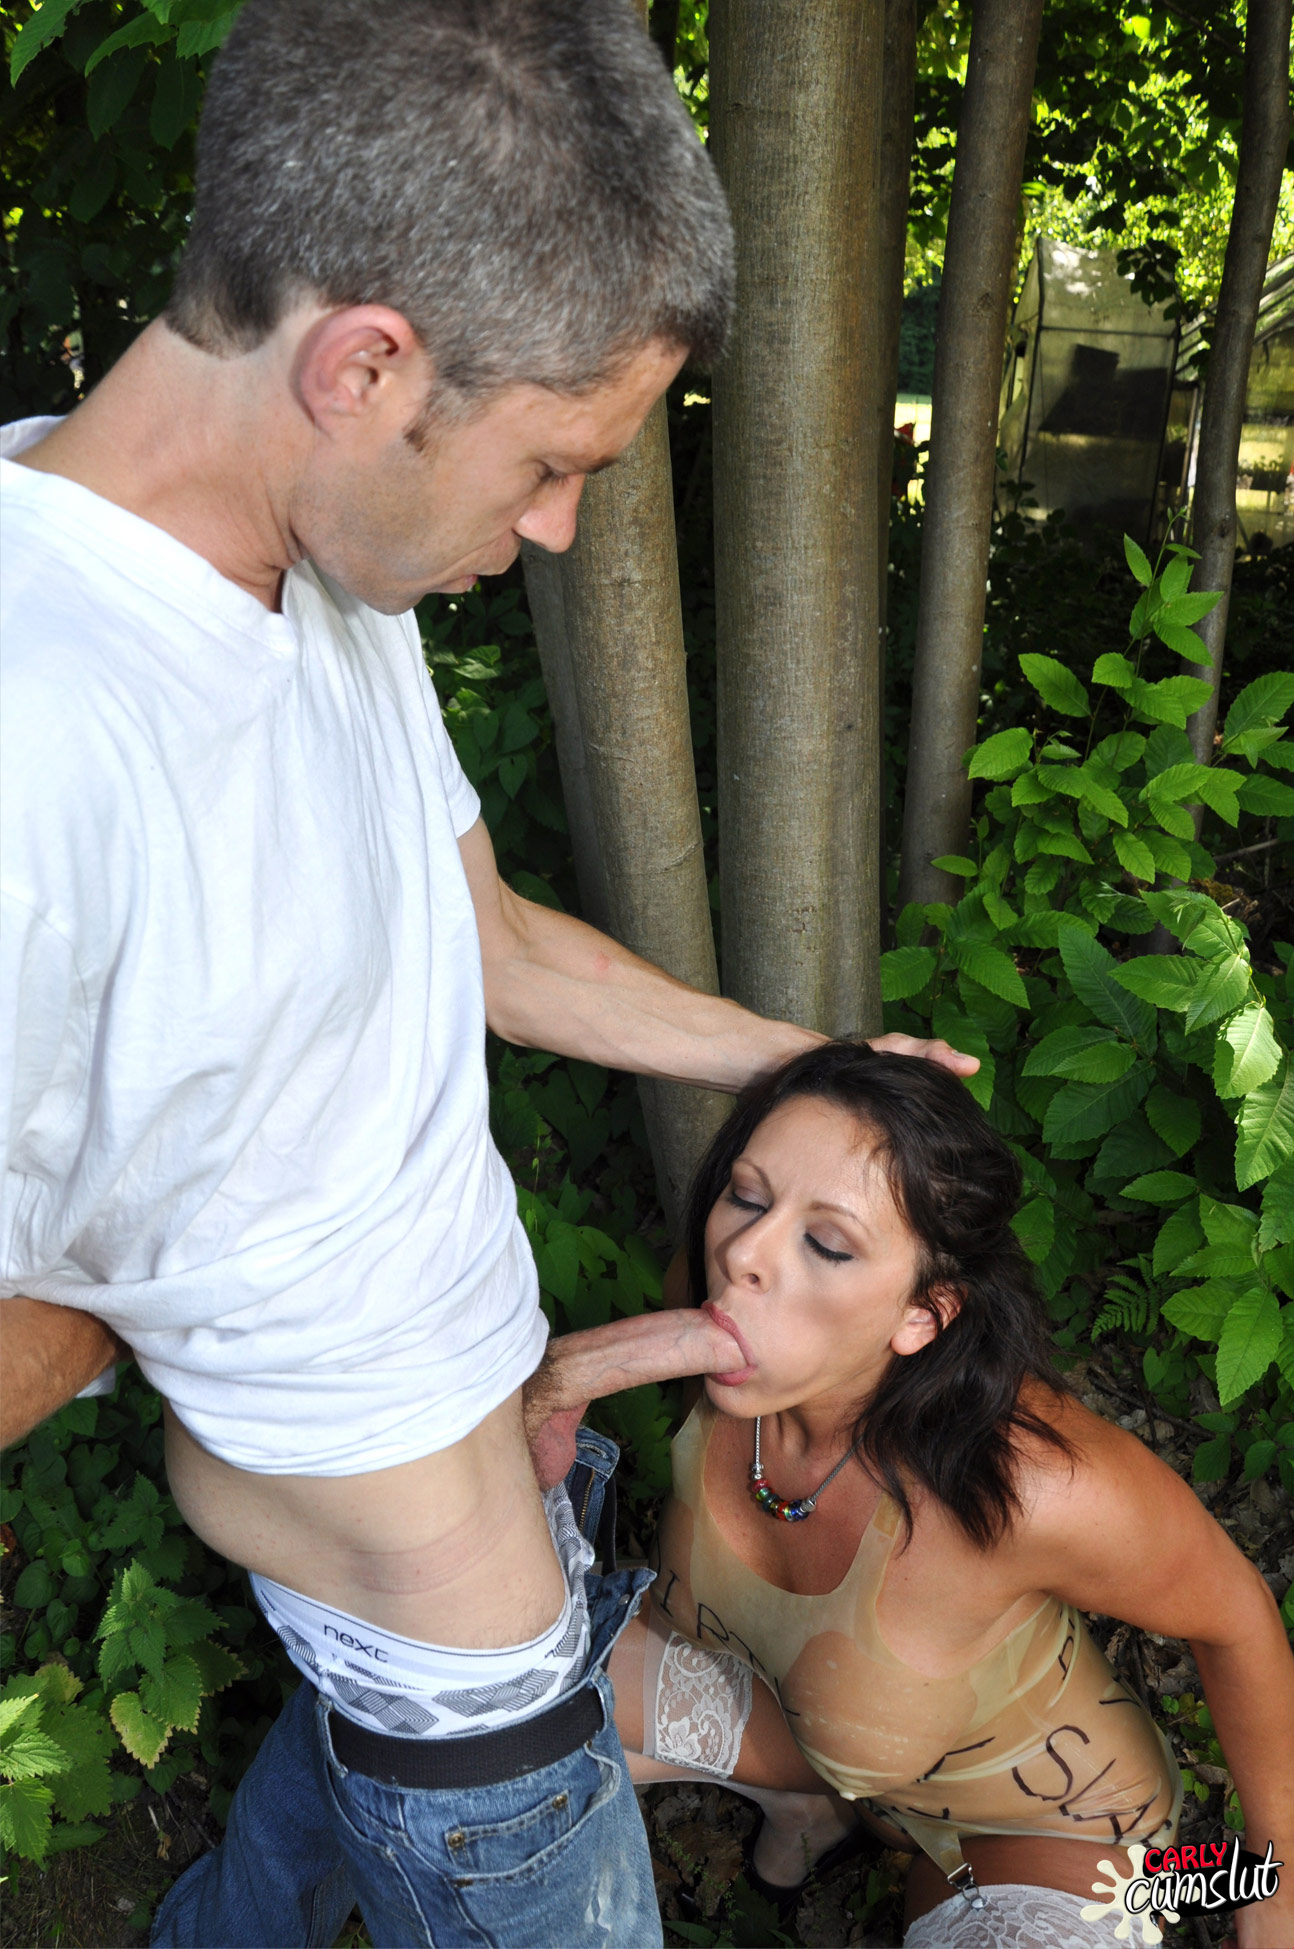 Teen girl strips outdoors